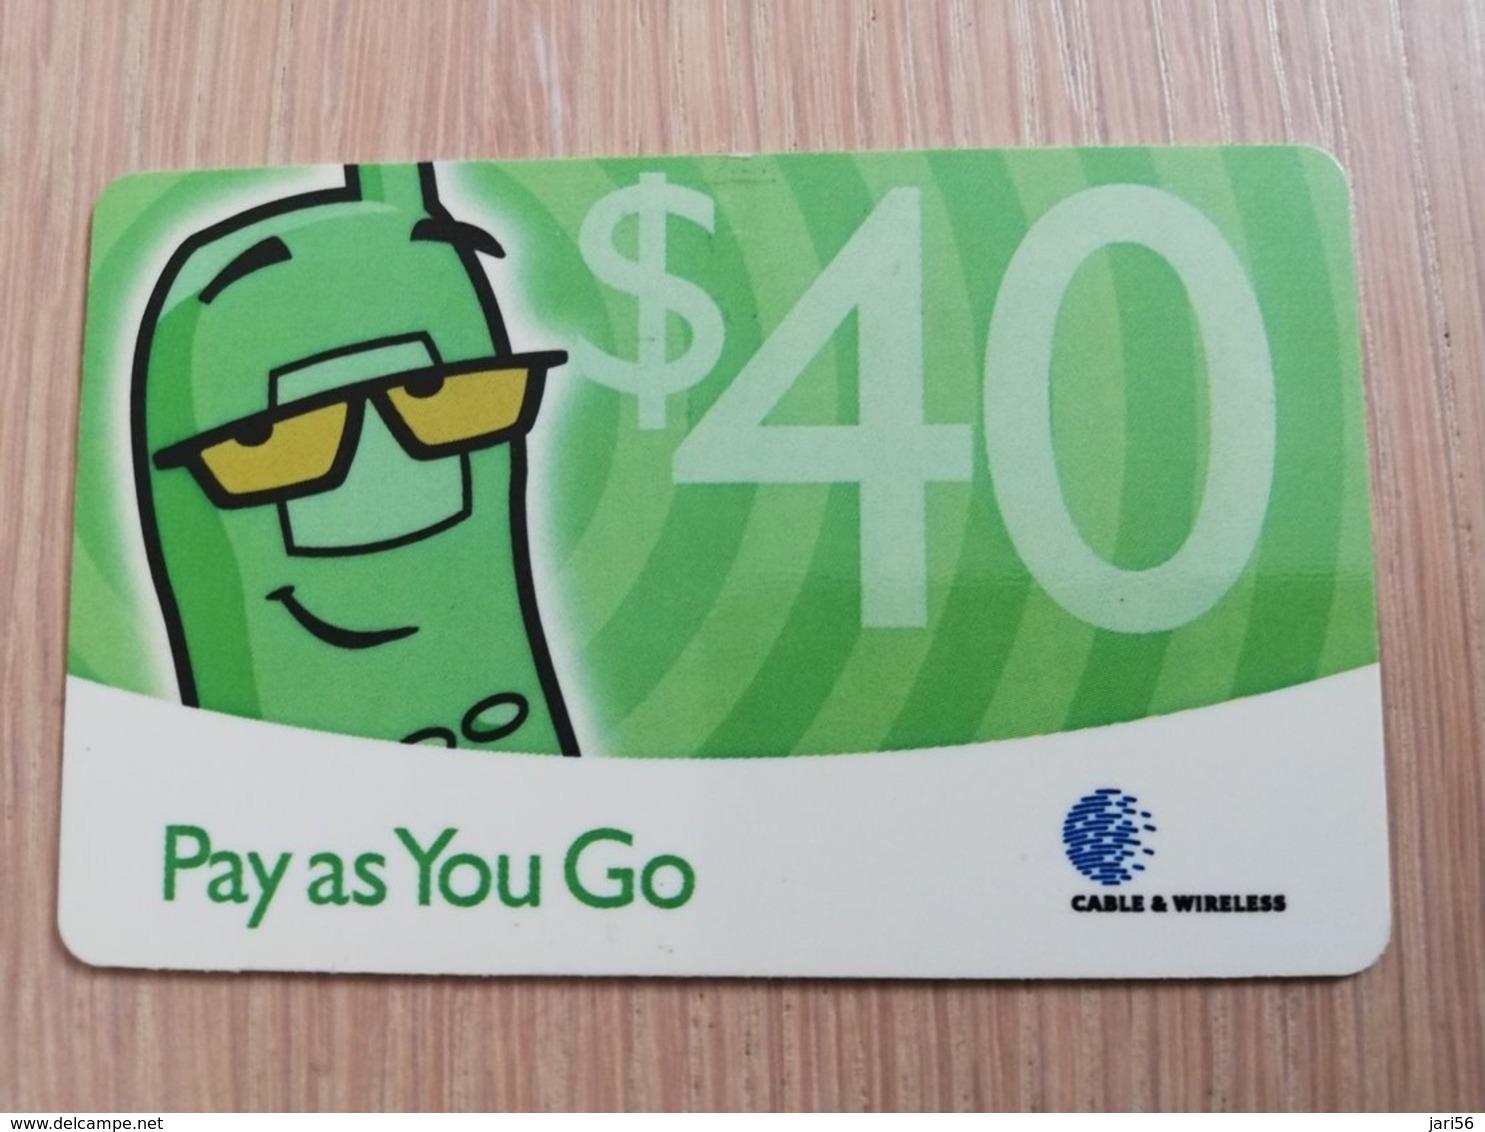 CAYMAN ISLANDS  $40,- PAY AS YOU GO GREEN  Prepaid  Fine Used Card  ** 2086 ** - Iles Cayman